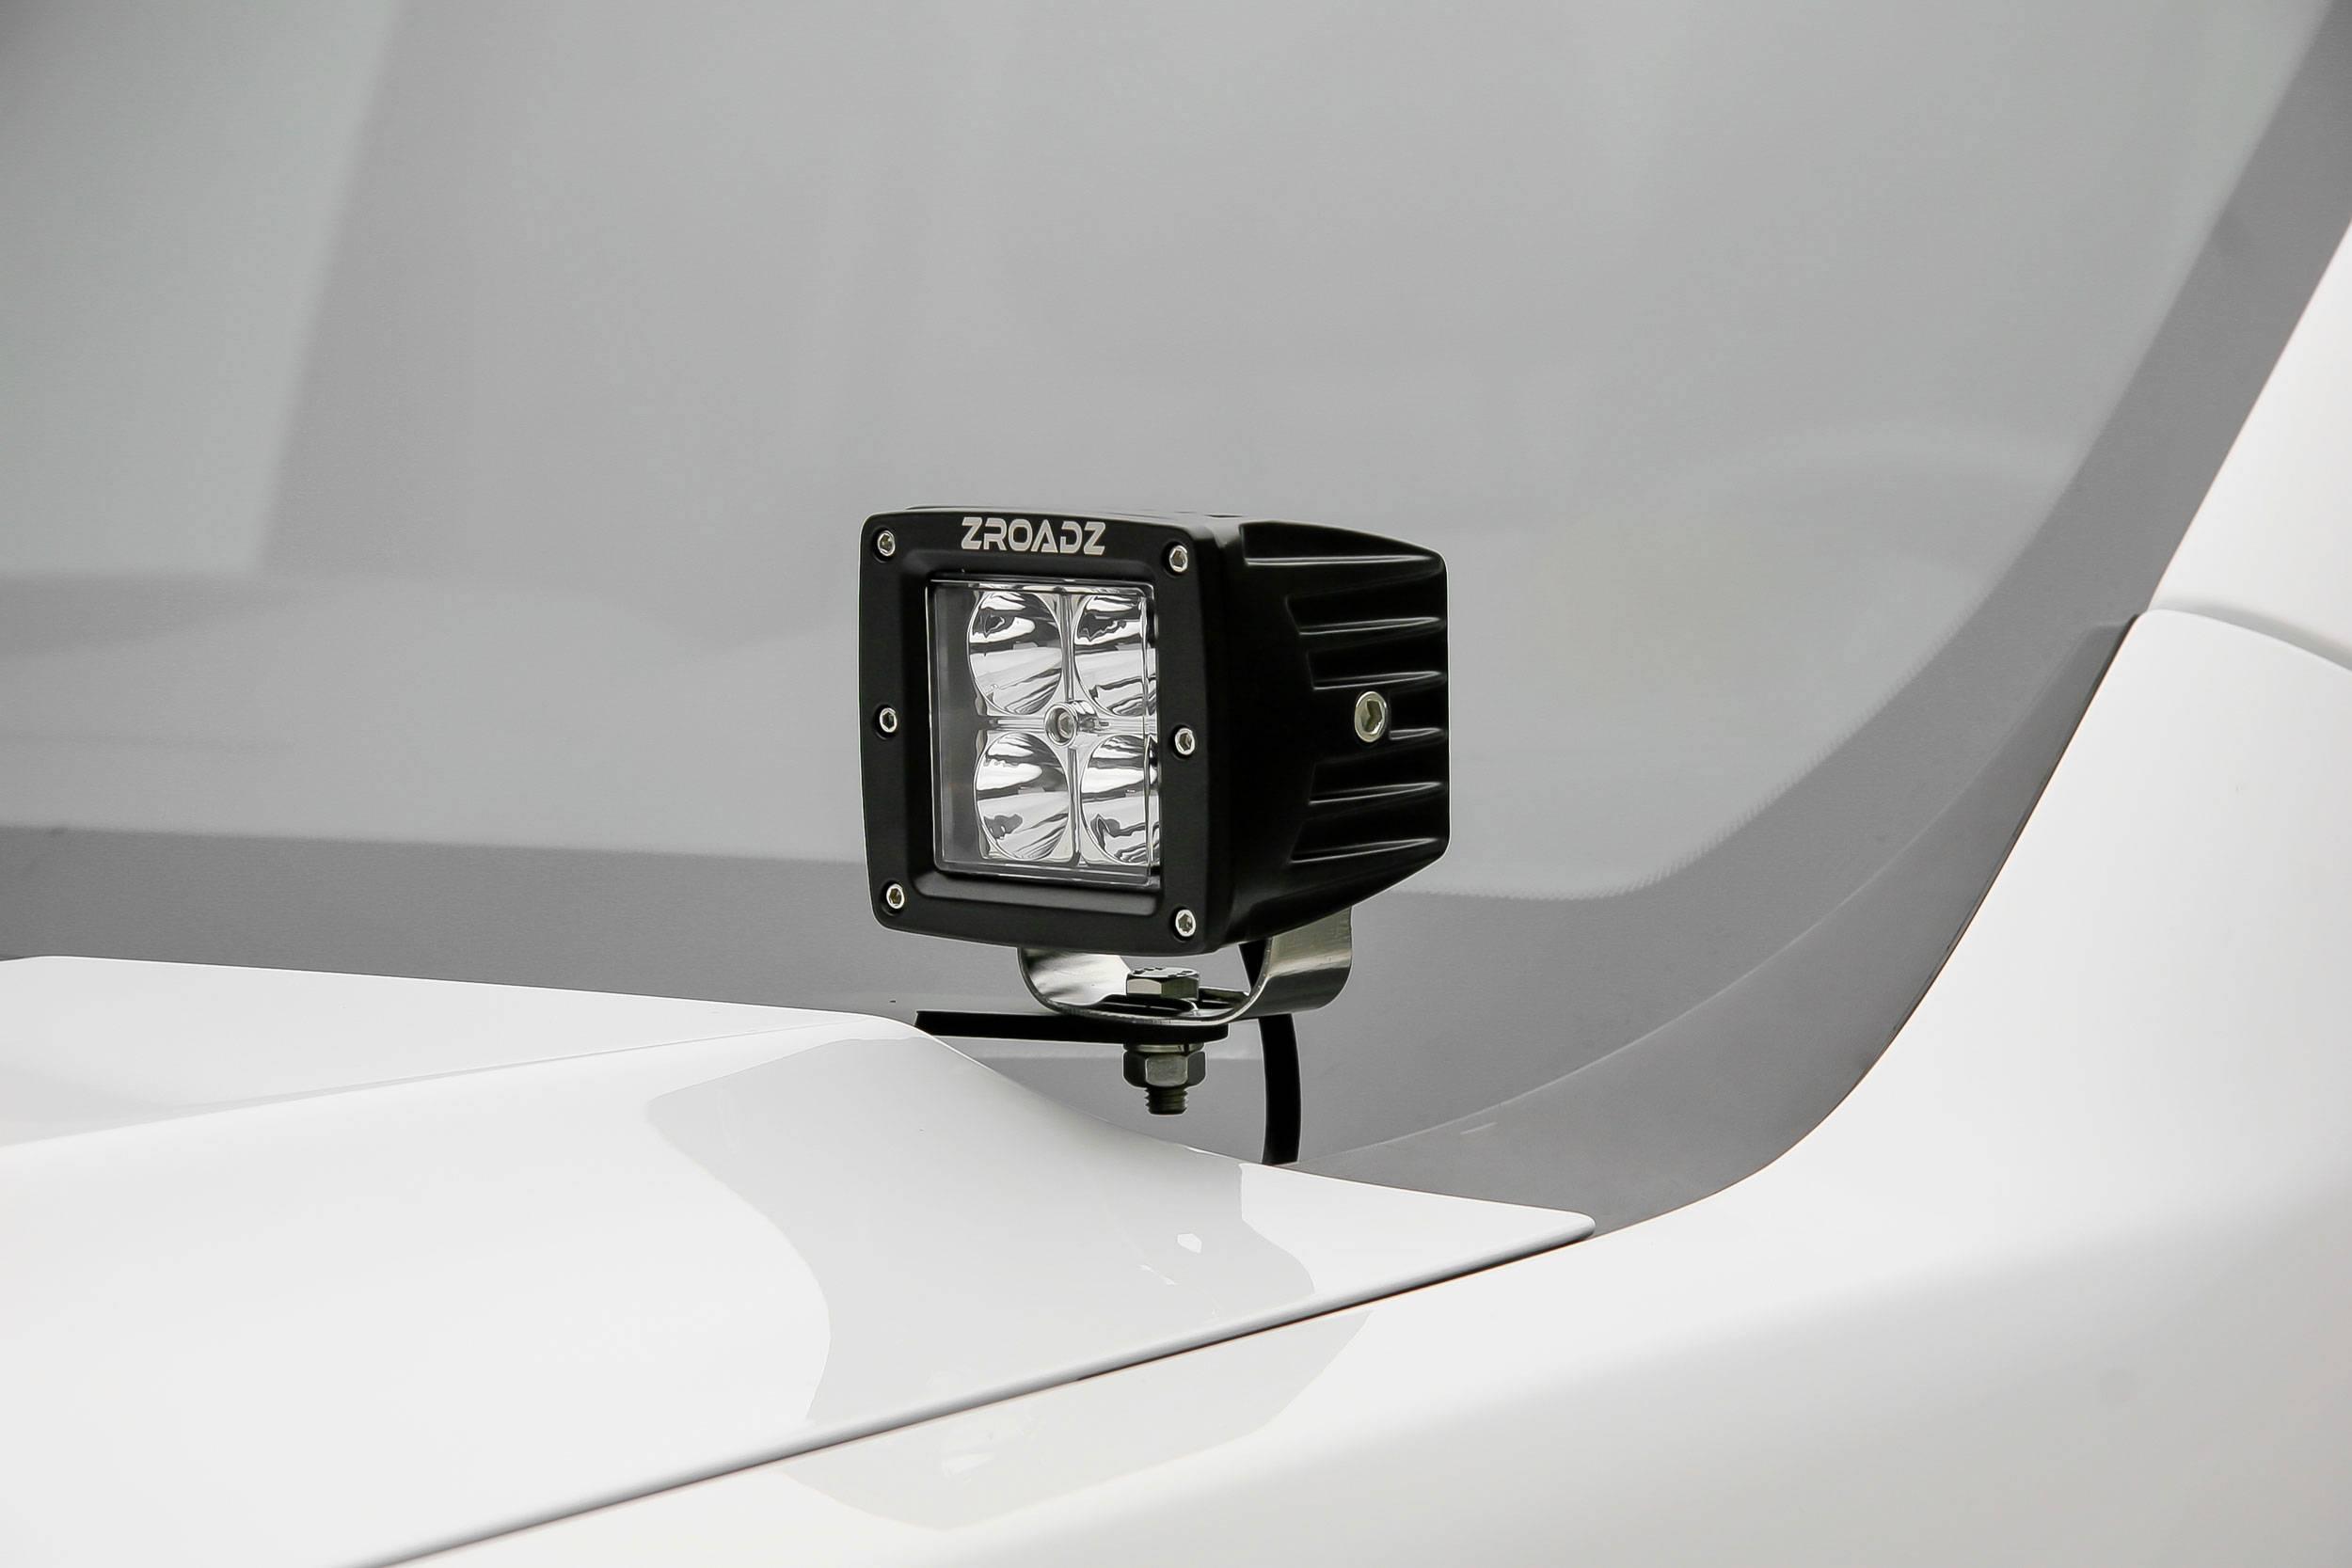 ZROADZ OFF ROAD PRODUCTS - 2015-2017 Ford F-150 Hood Hinge LED Kit with (2) 3 Inch LED Pod Lights - PN #Z365731-KIT2